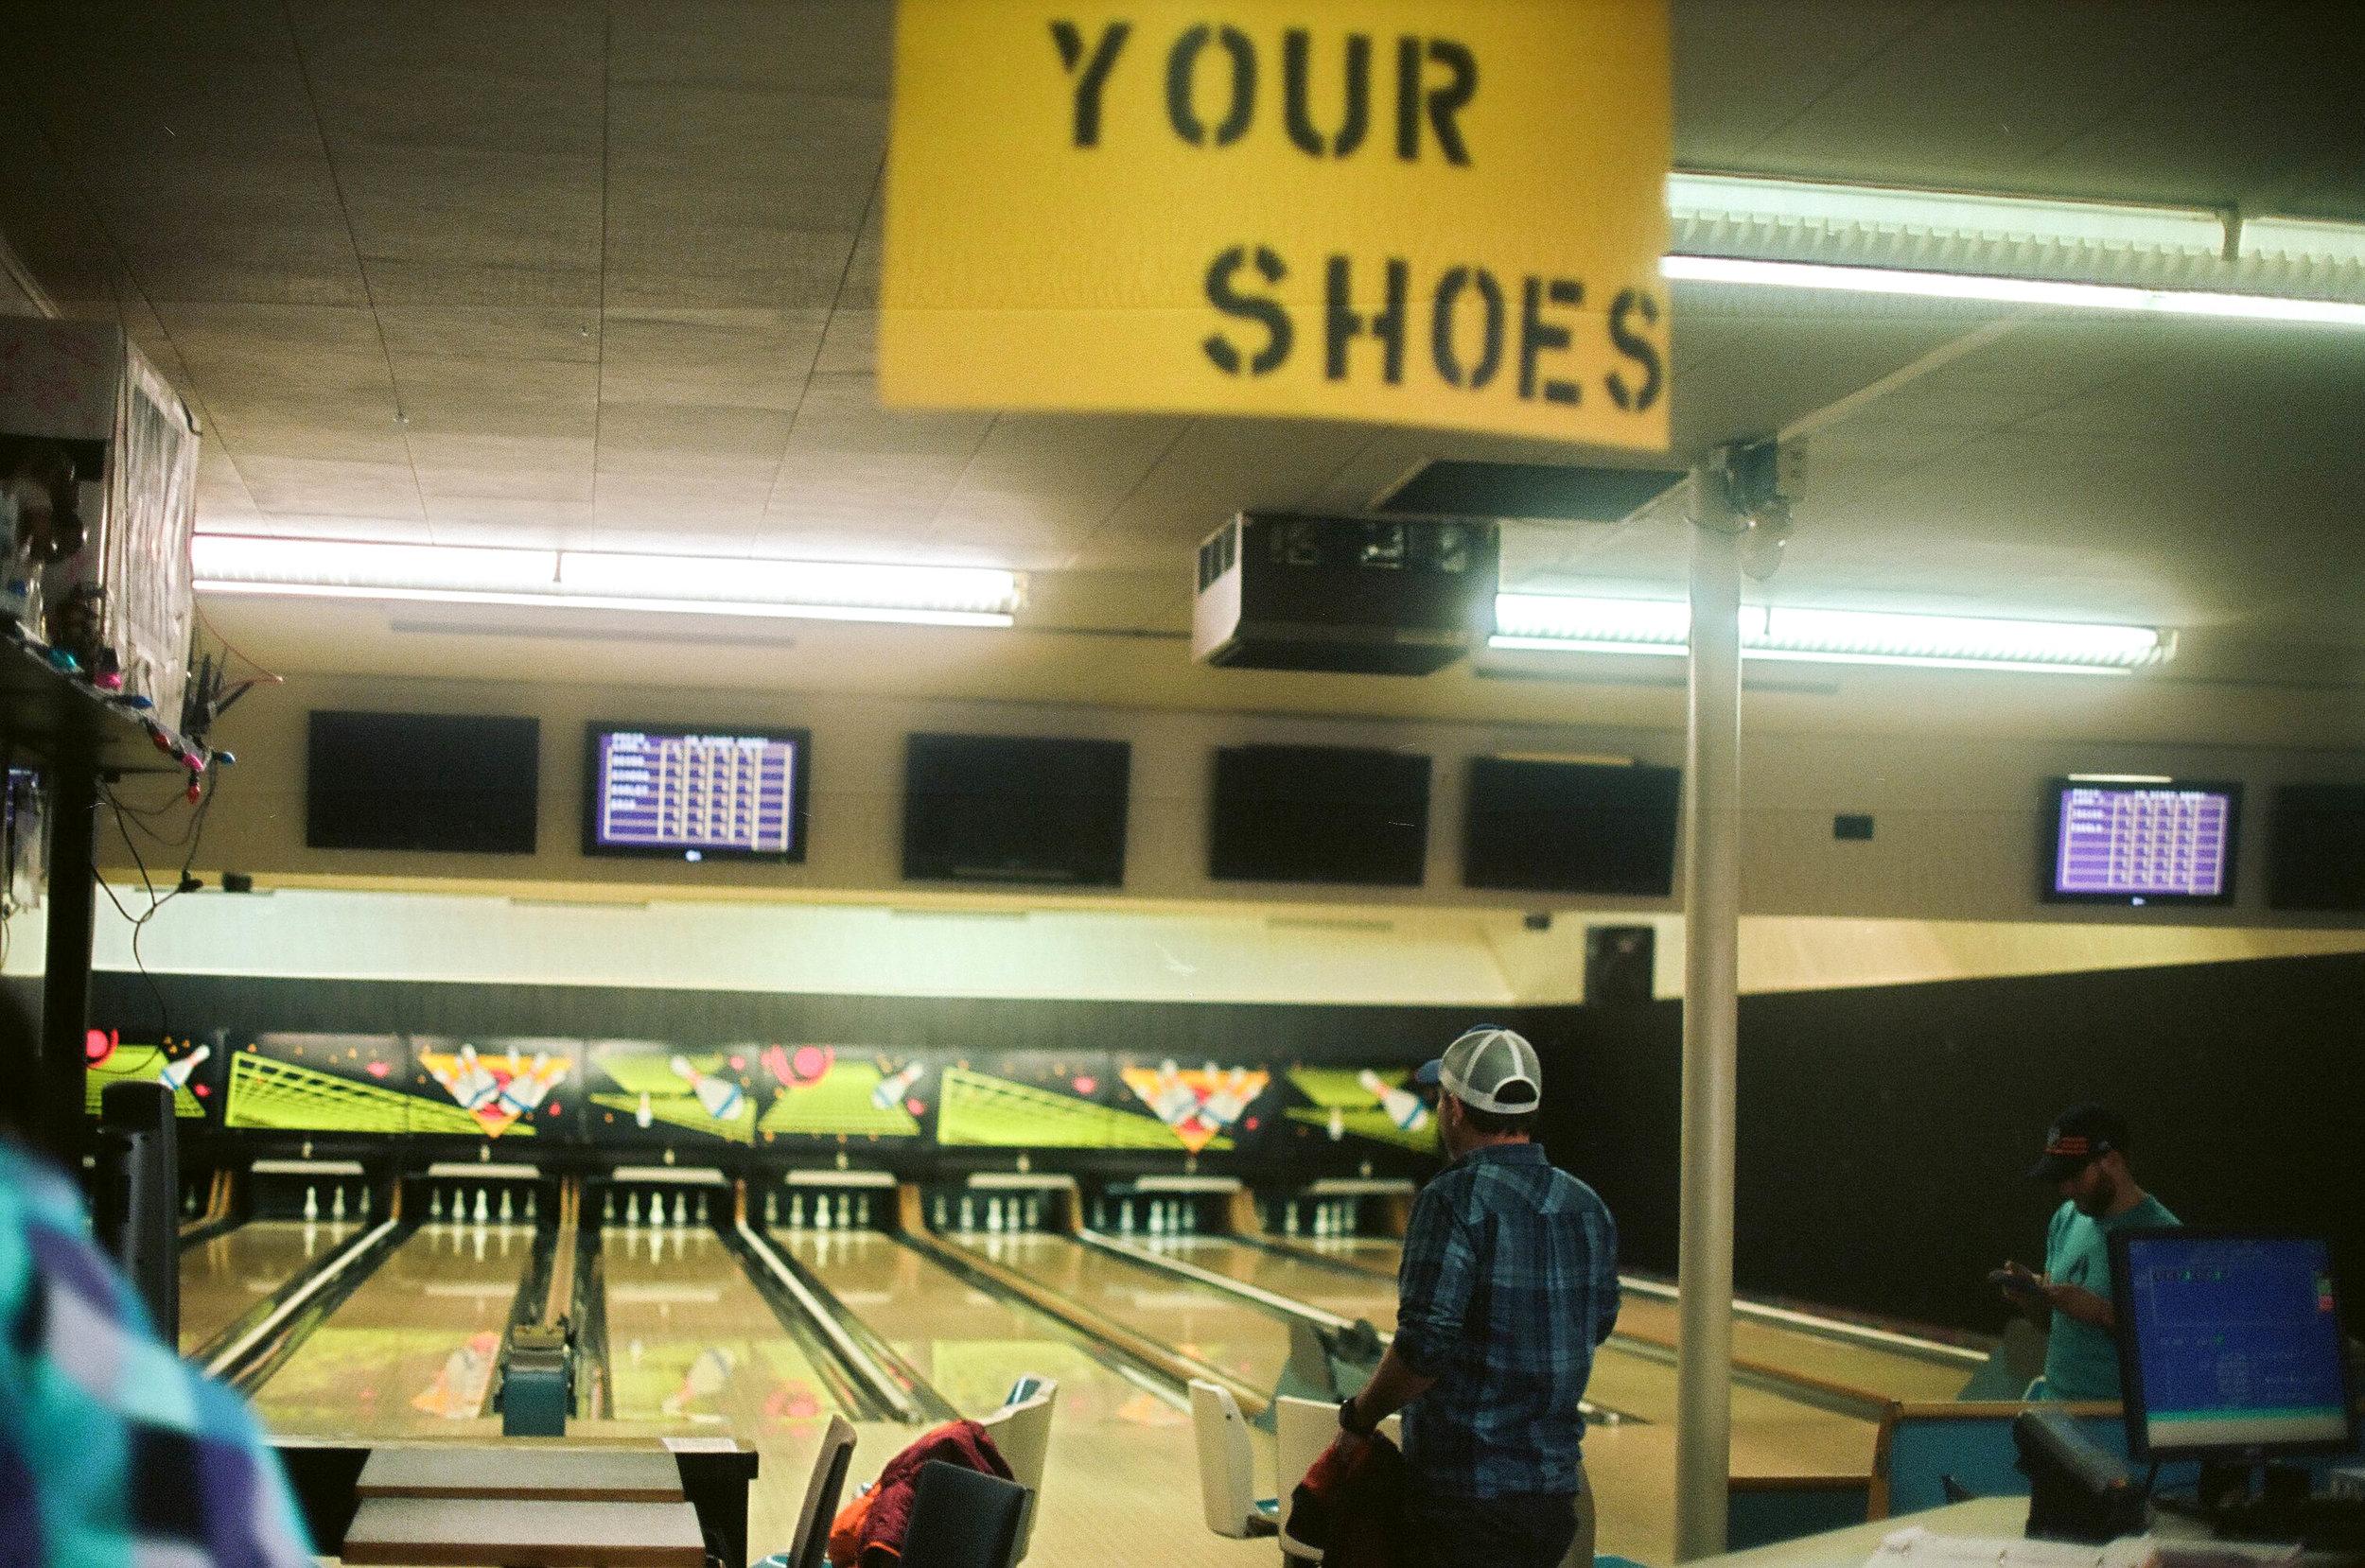 Terrace bowling alley